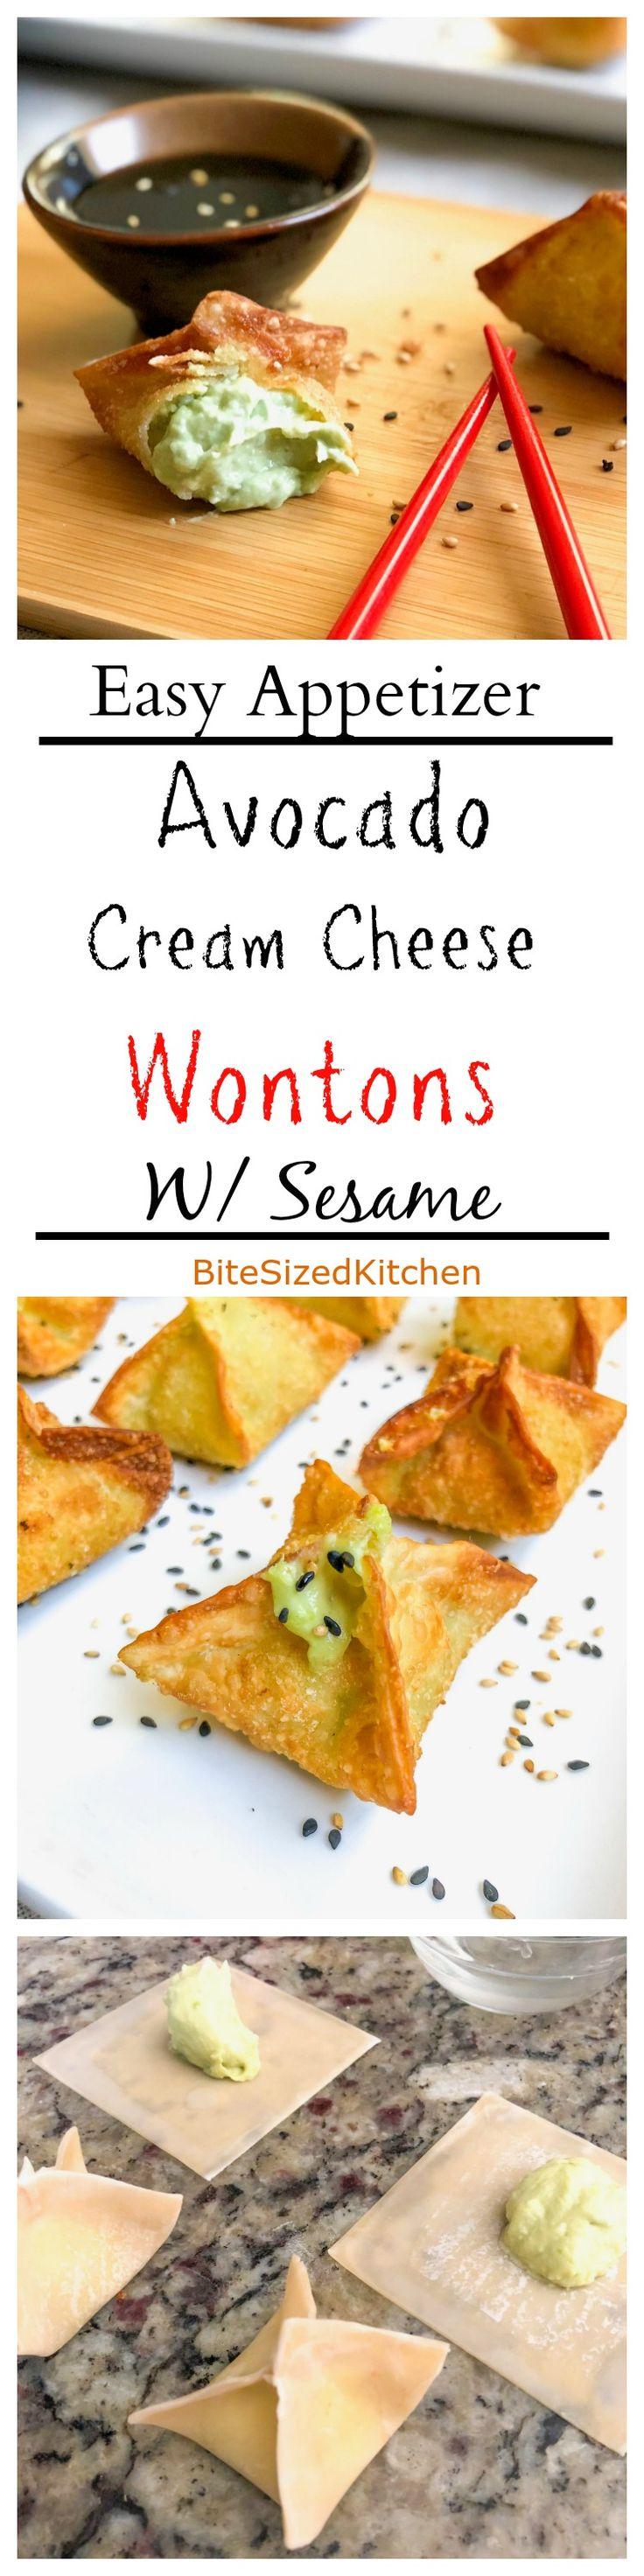 Easy Avocado Sweet Cream Cheese Wontons Appetizer…Edit description